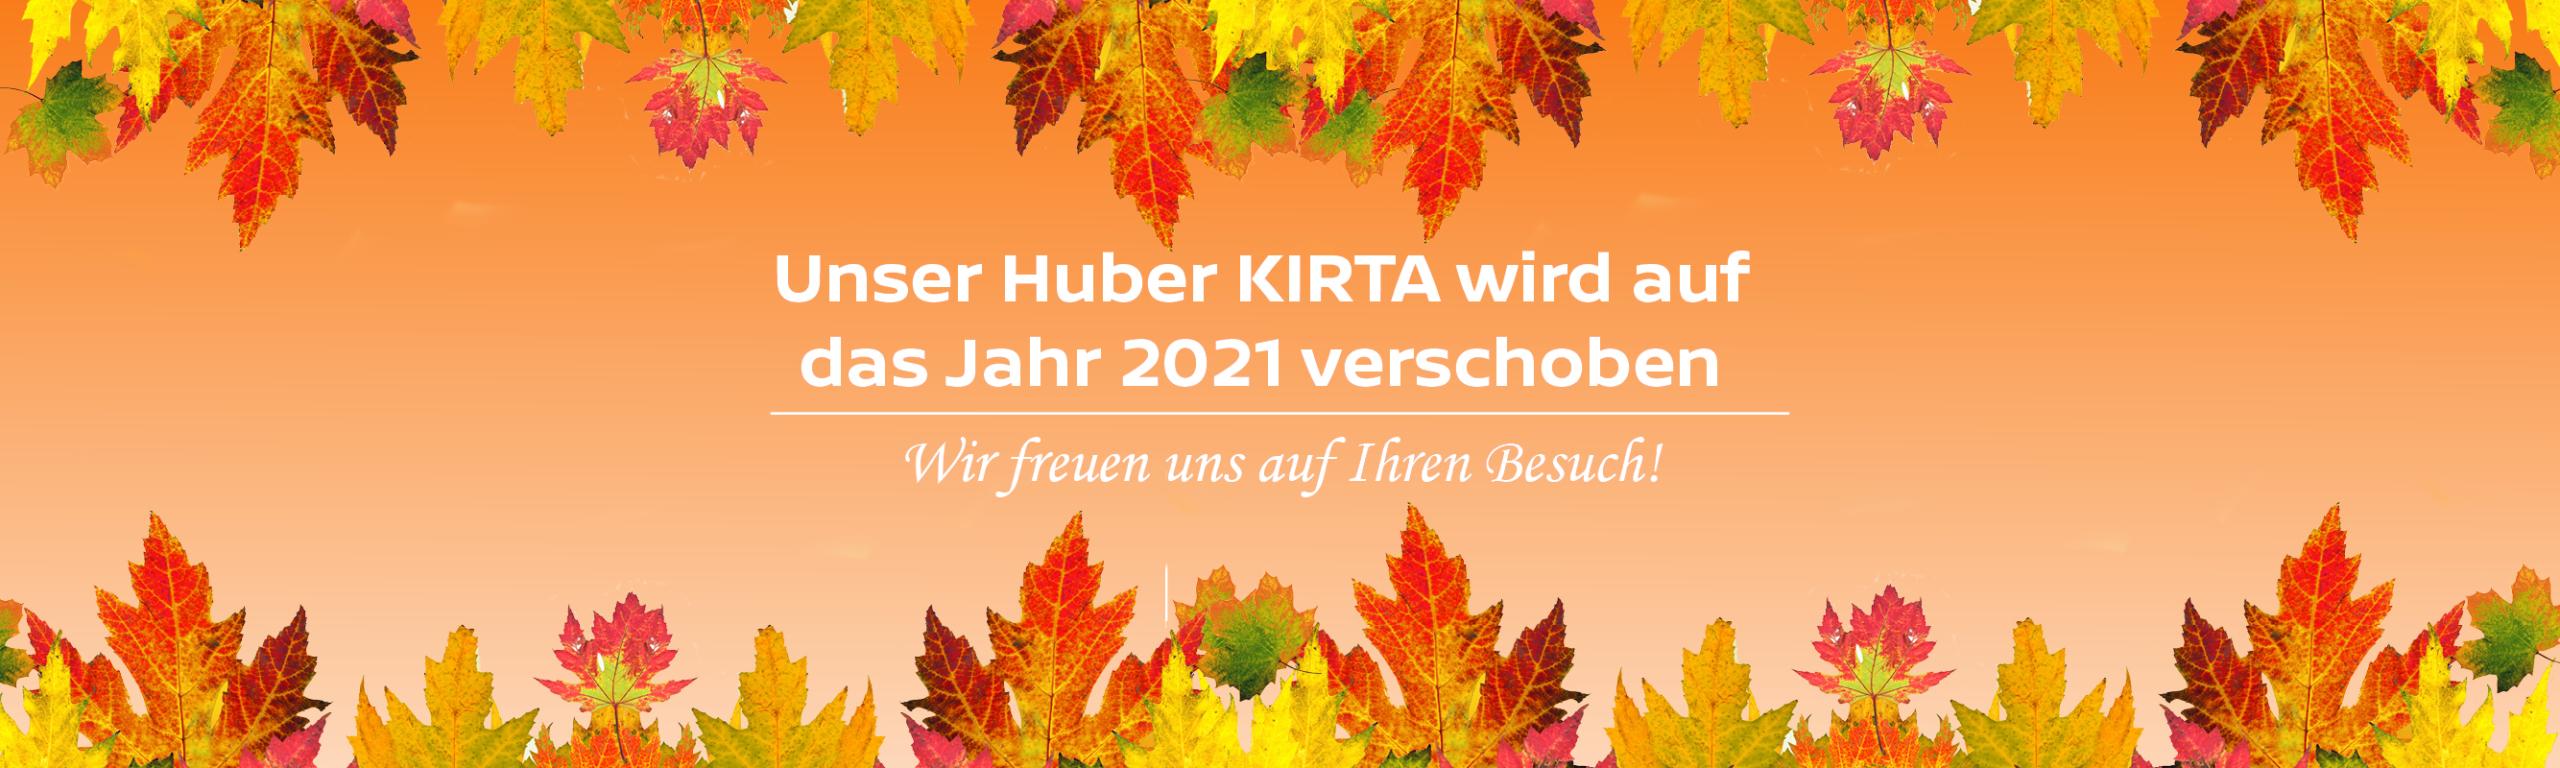 Huber Kirta Bild